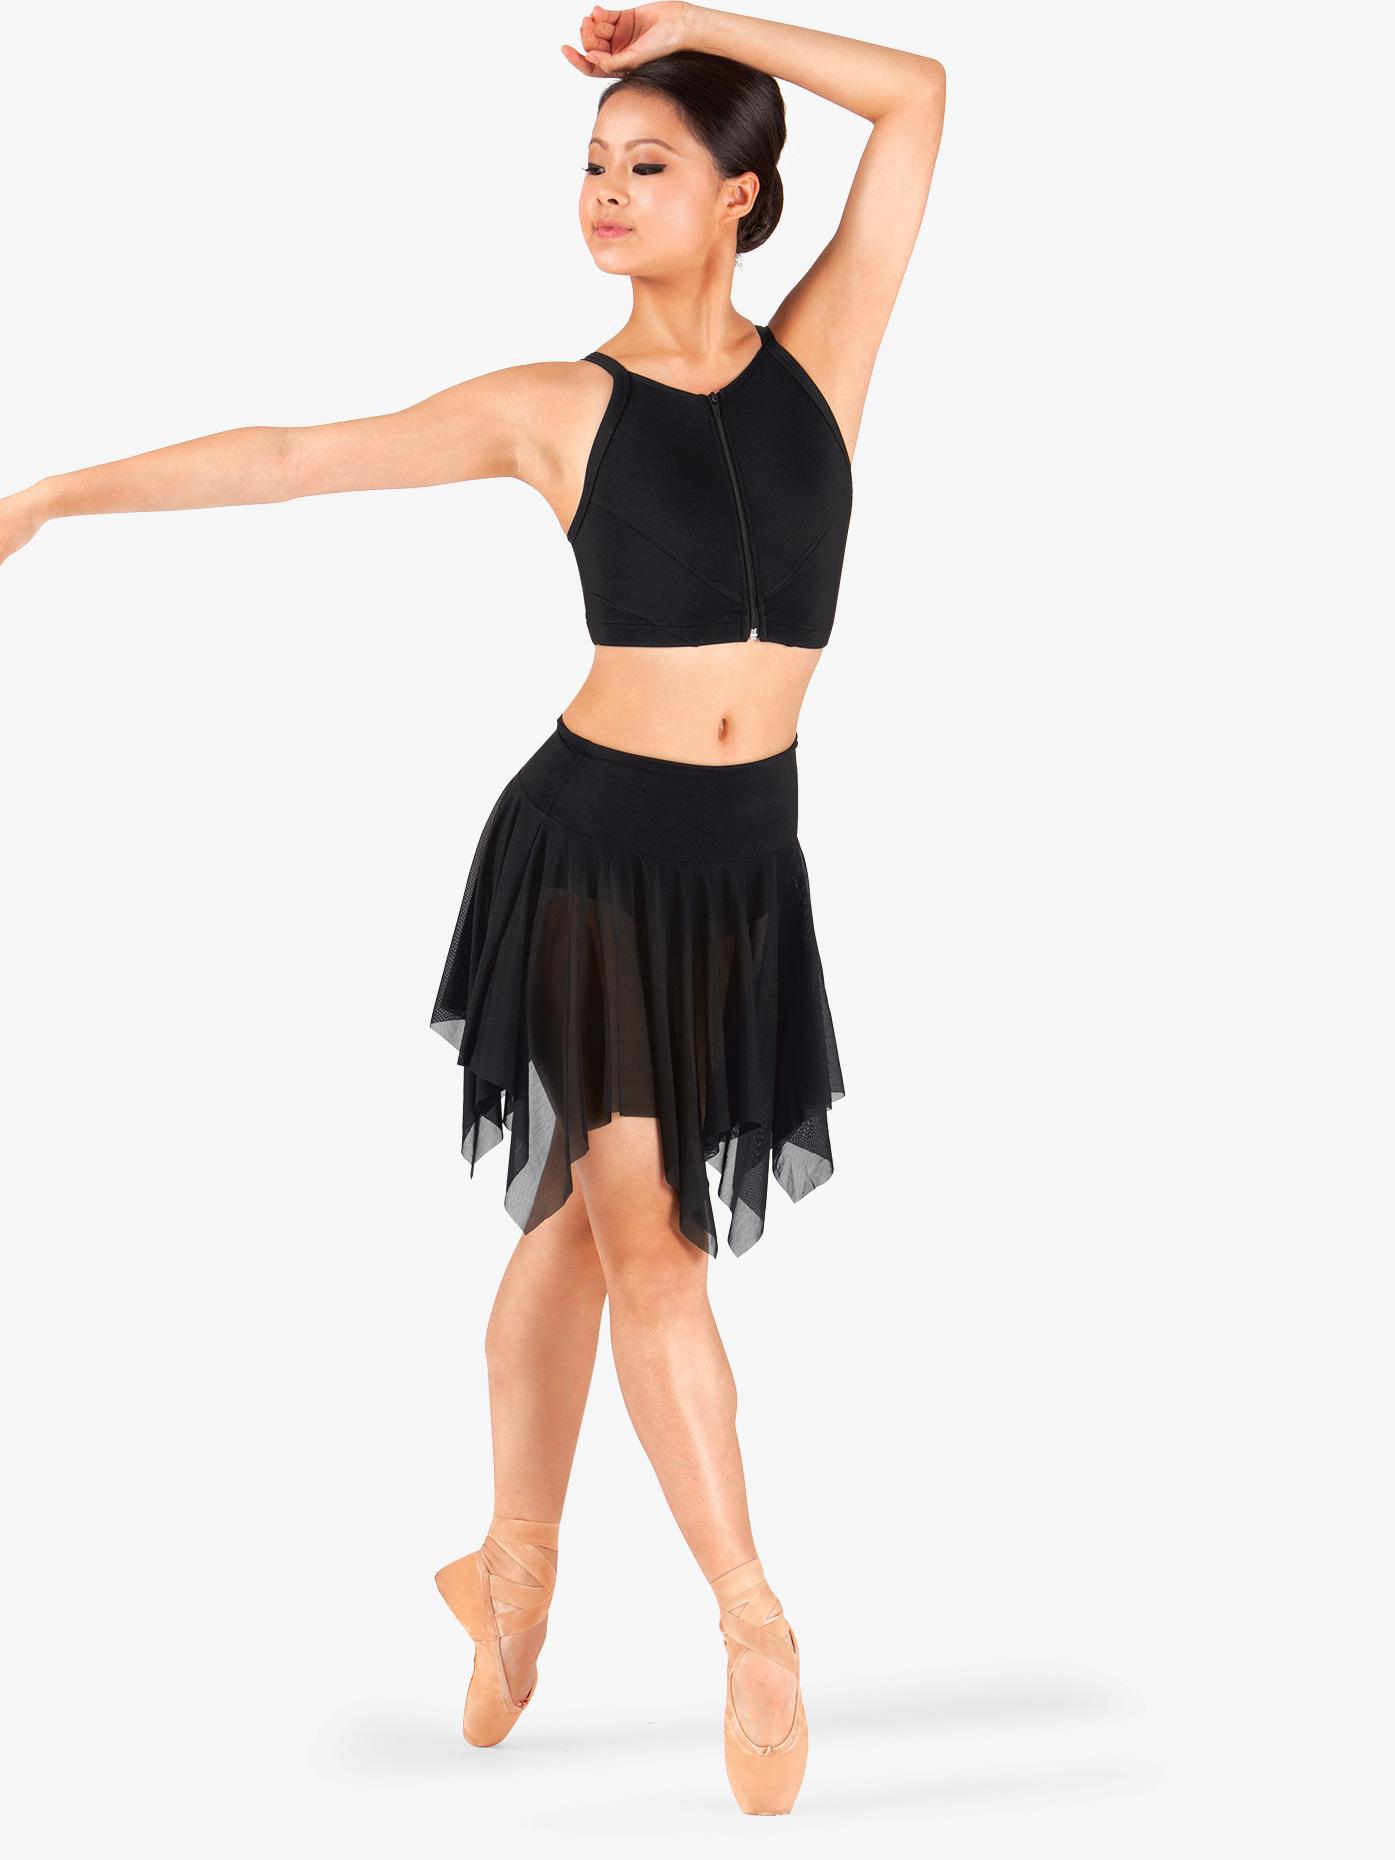 Body Wrappers Adult Mesh Handkerchief Dance Skirt BW9102